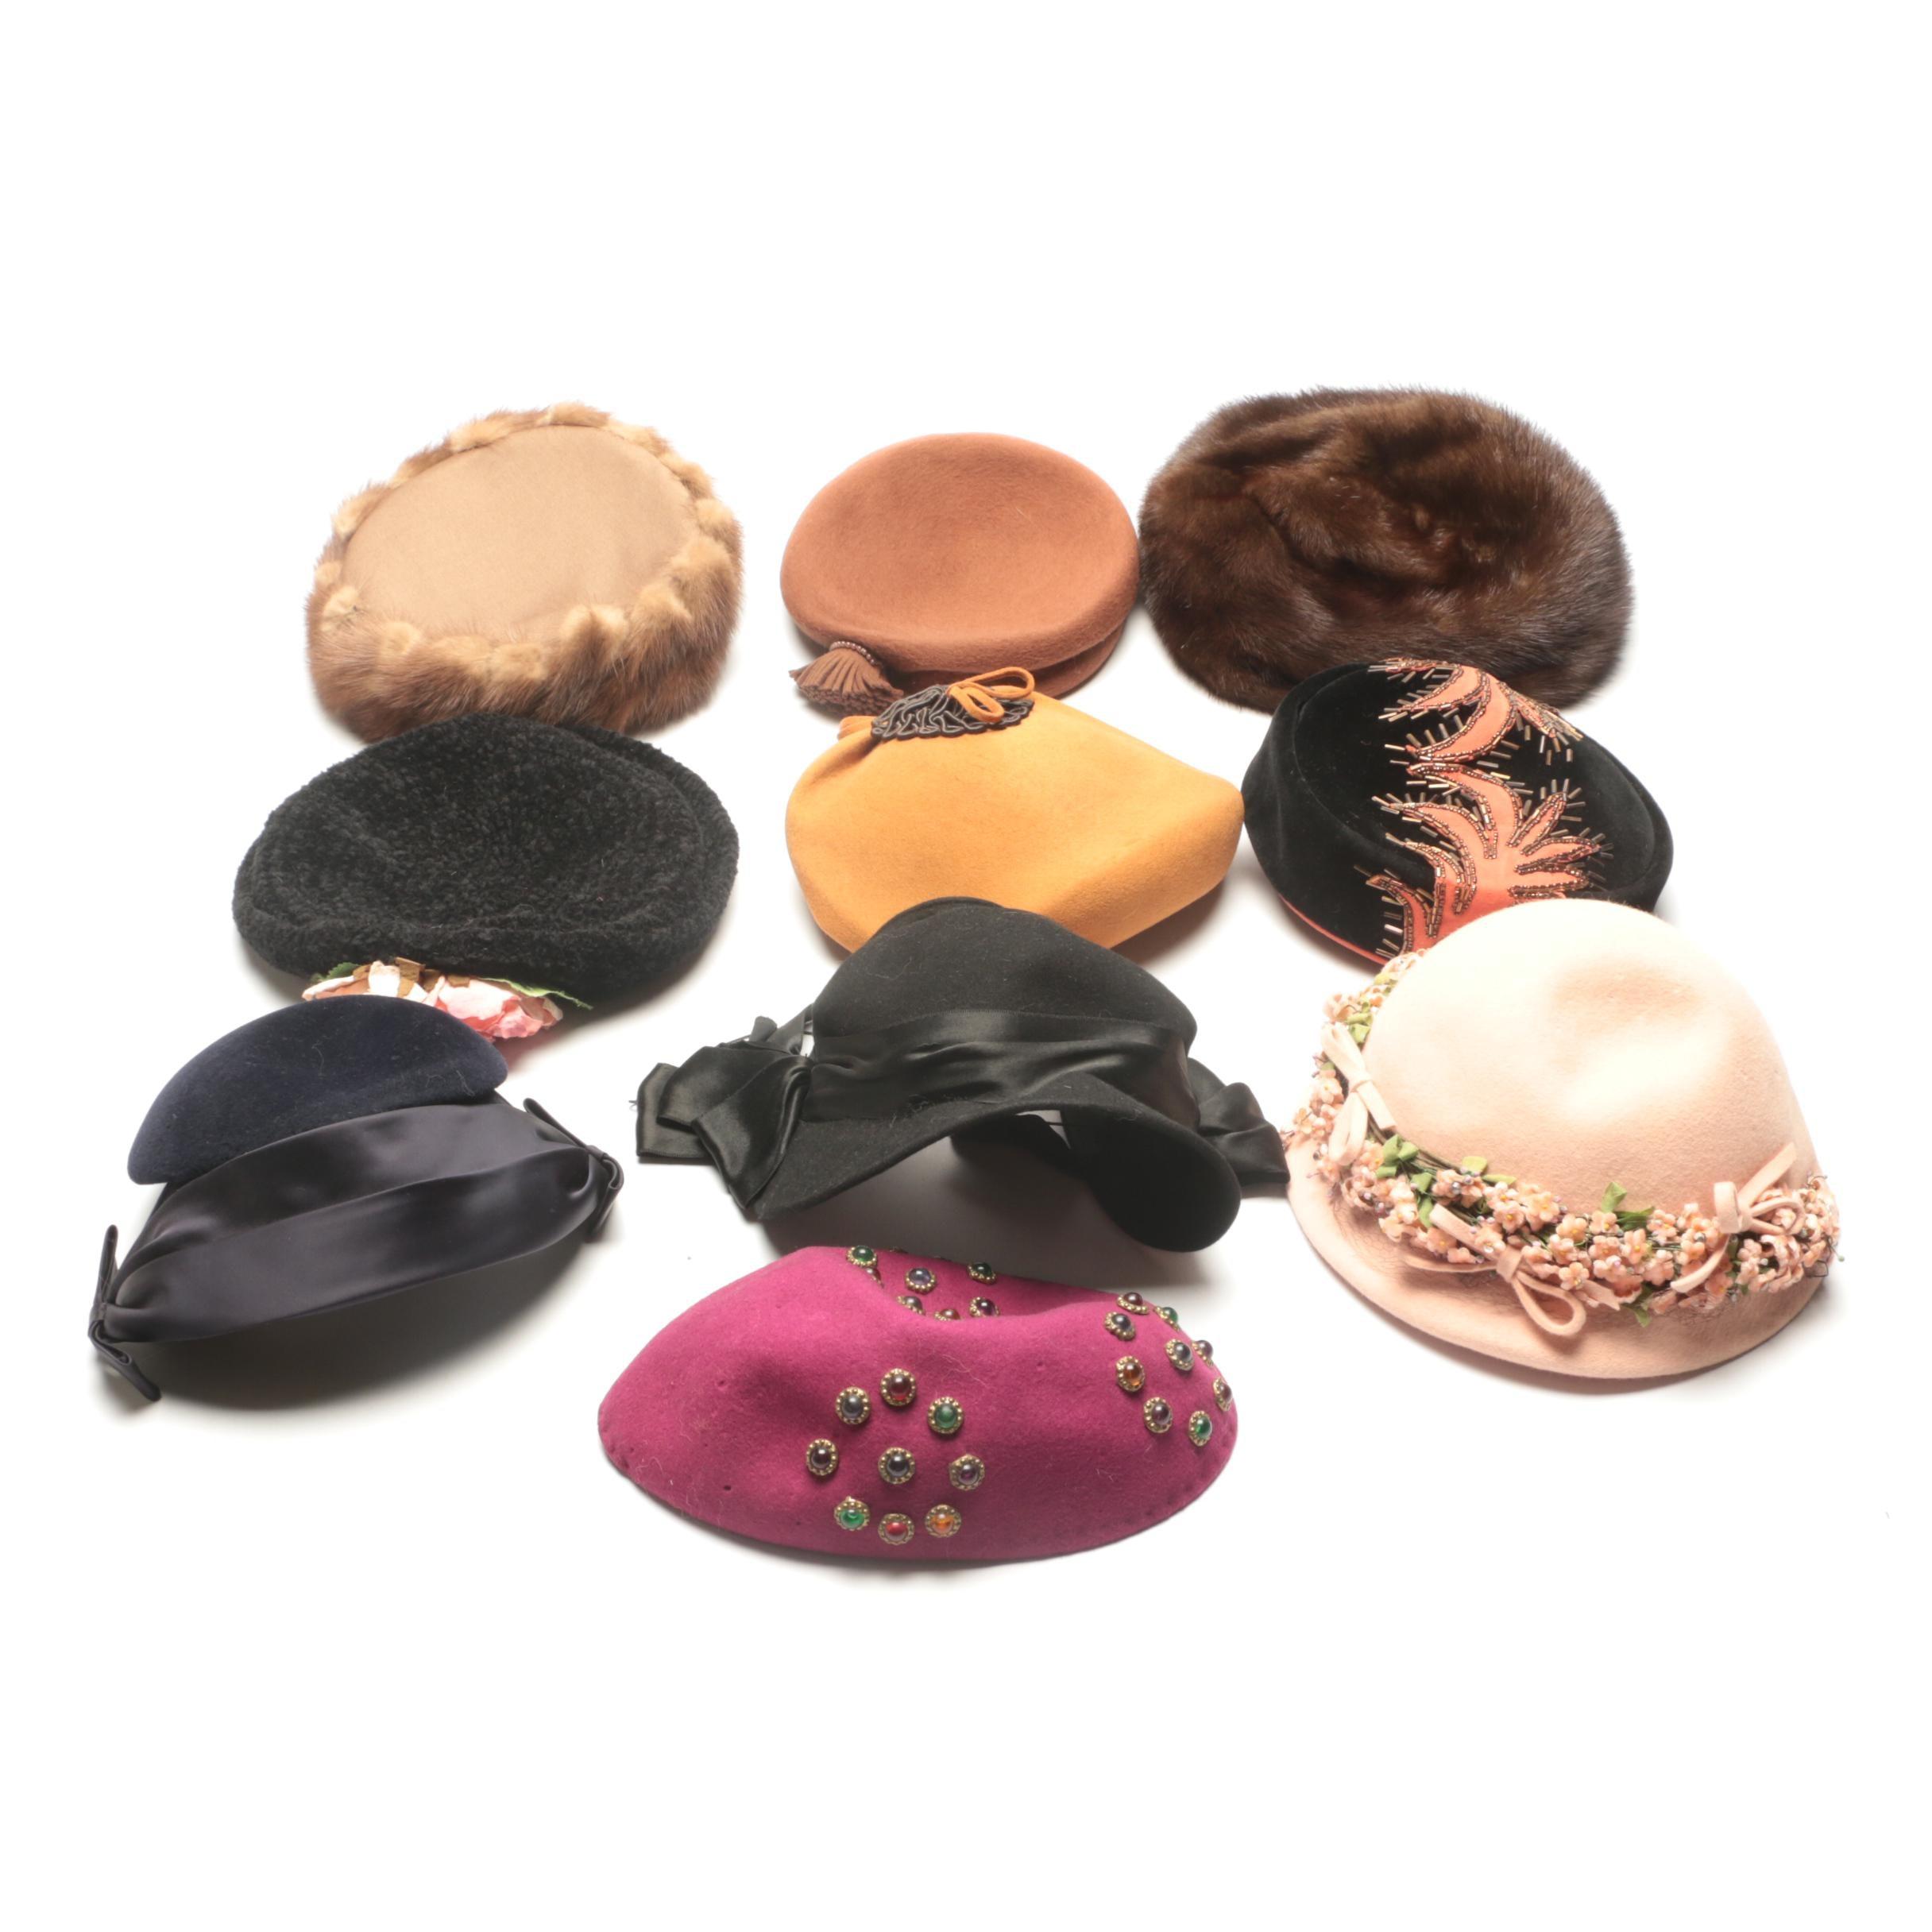 Circa 1940s Vintage Hats Including Mink Fur